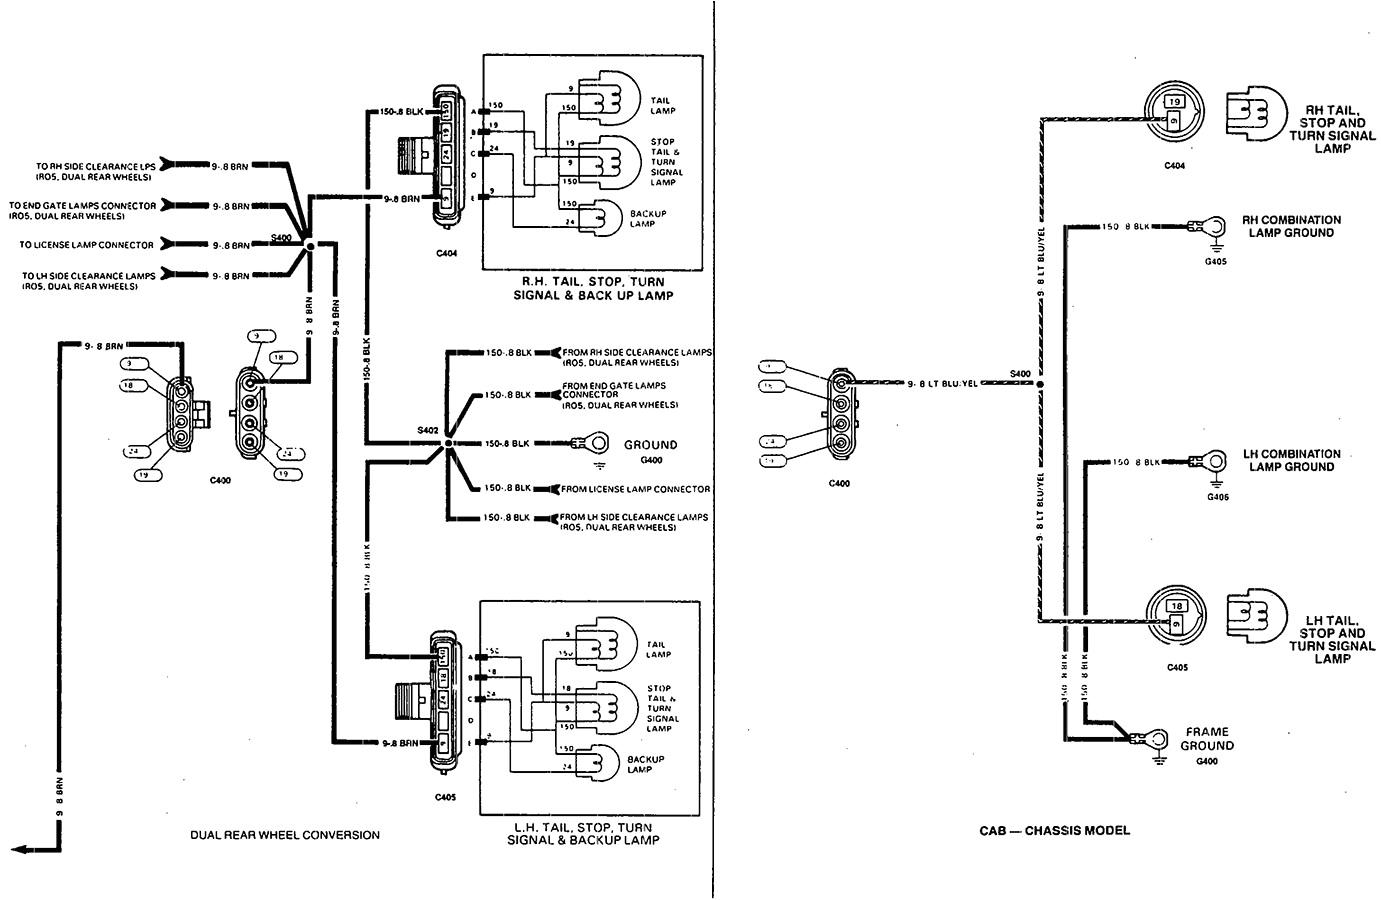 2006 silverado tail light wiring diagram 2003 chevrolet diagrams schematics 1992 chevy truck png